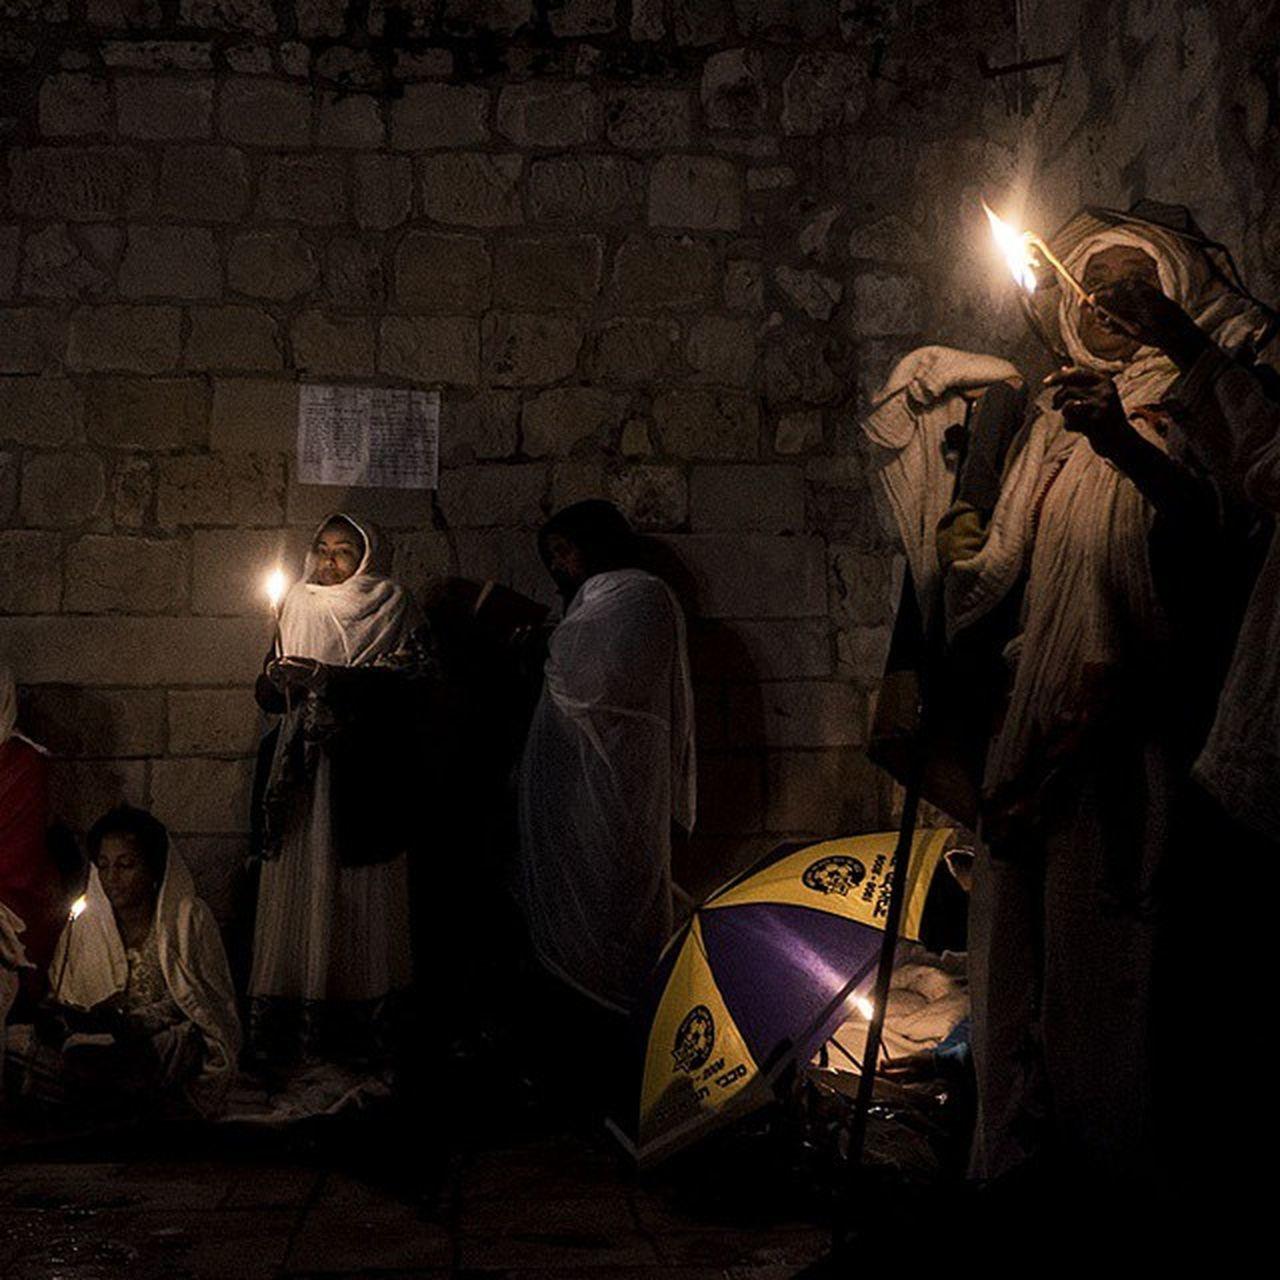 night, candle, illuminated, flame, indoors, men, adult, people